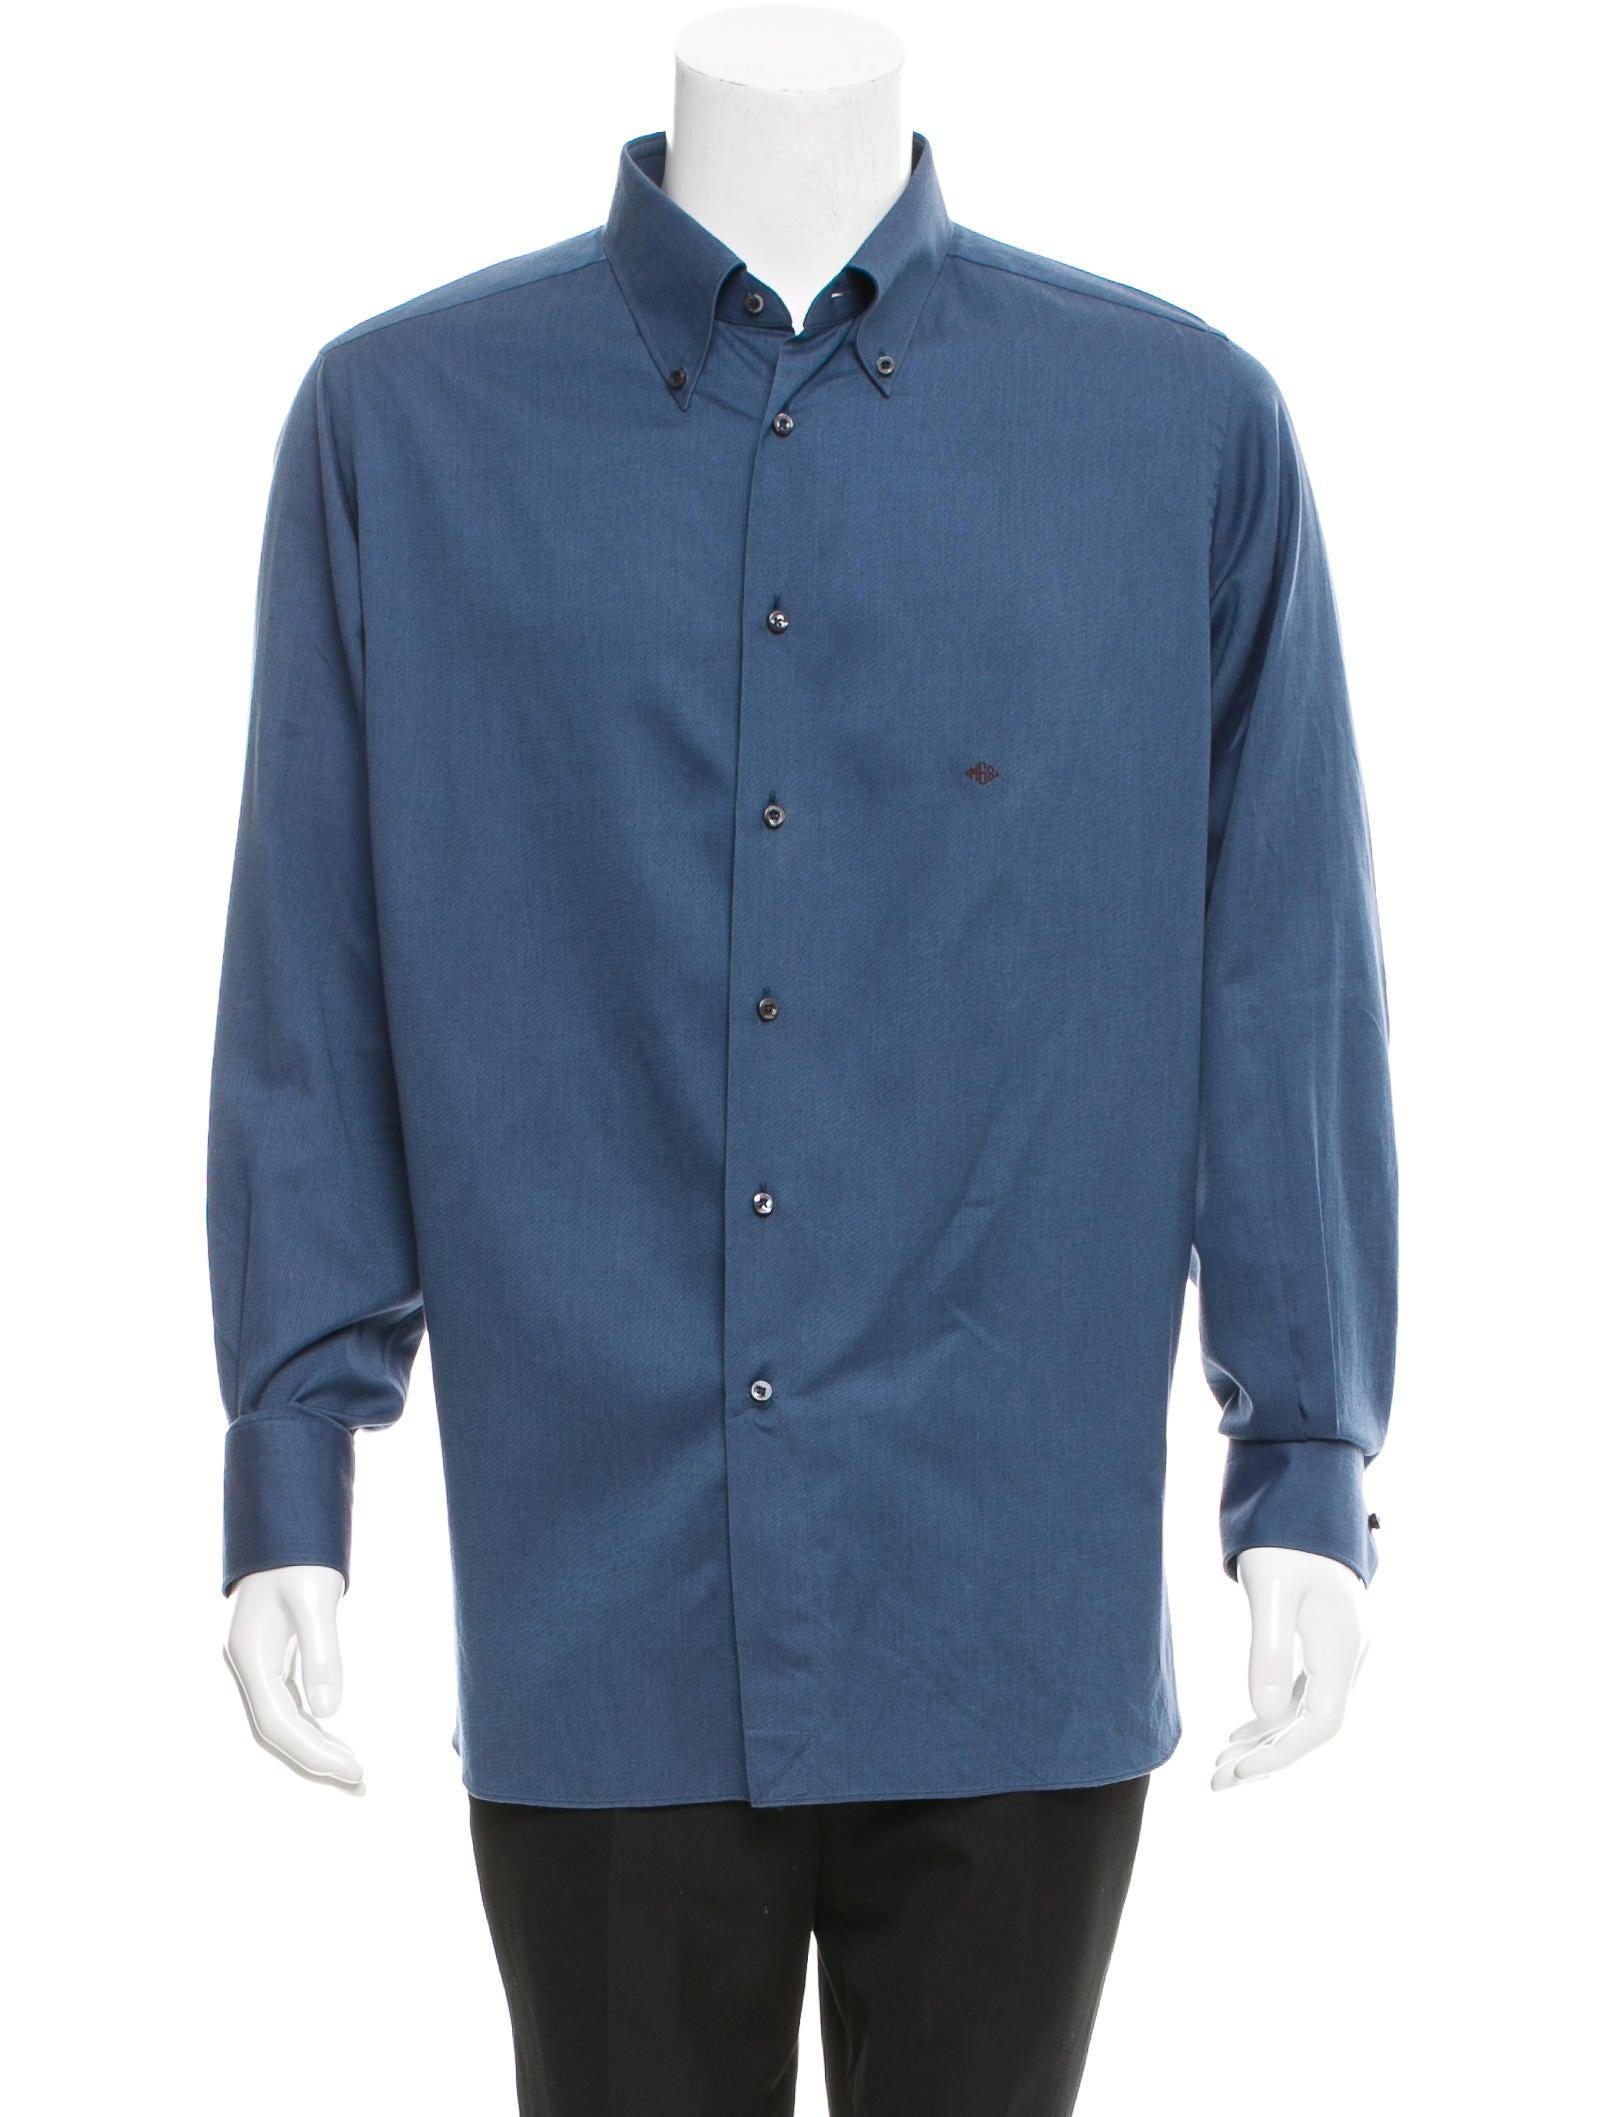 ermenegildo zegna su misura button up shirt clothing zgn23985 the realreal. Black Bedroom Furniture Sets. Home Design Ideas